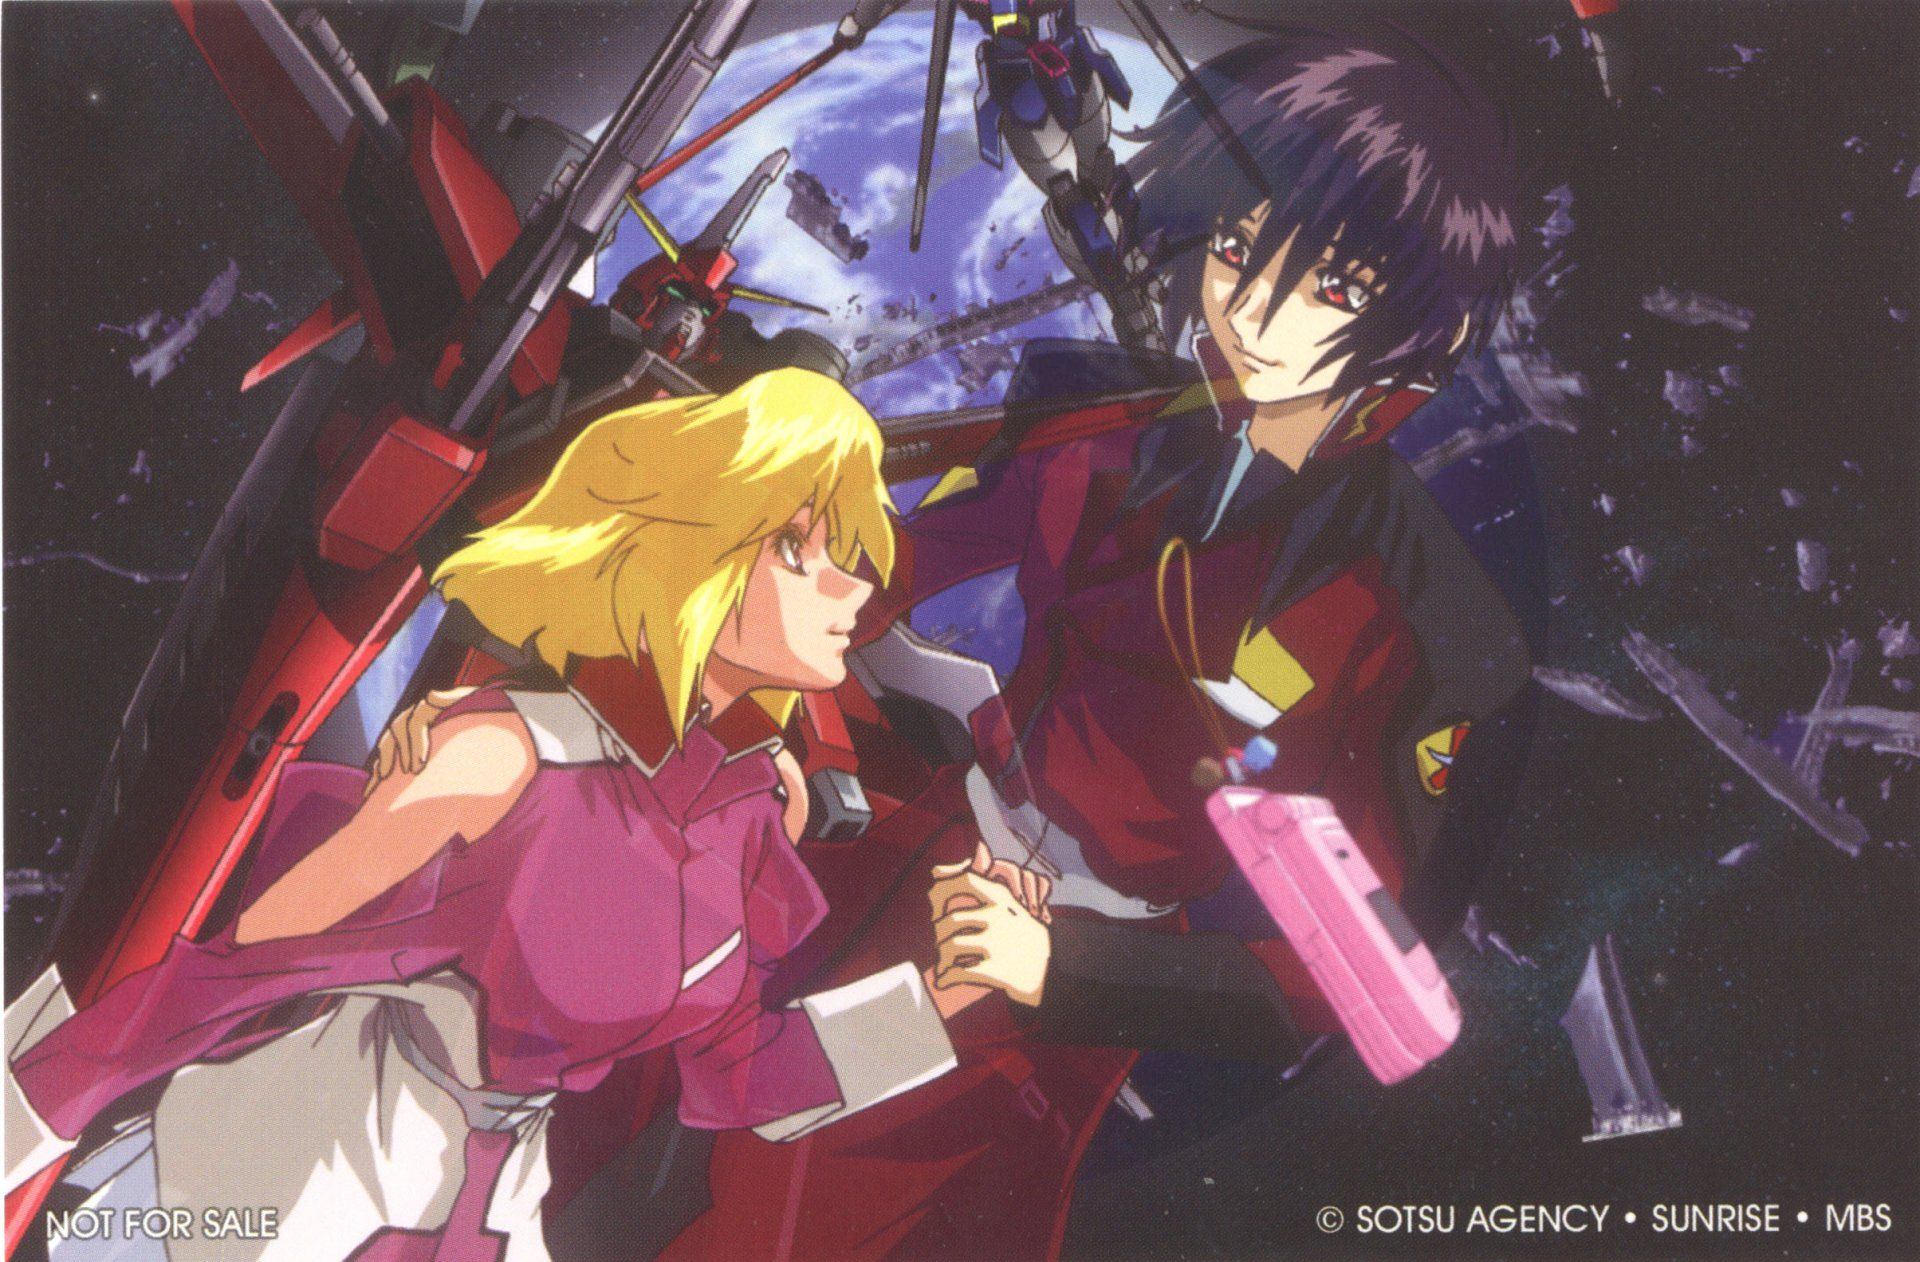 Anime Mobile Suit Gundam Seed Destiny Wallpaper ガンダムseed